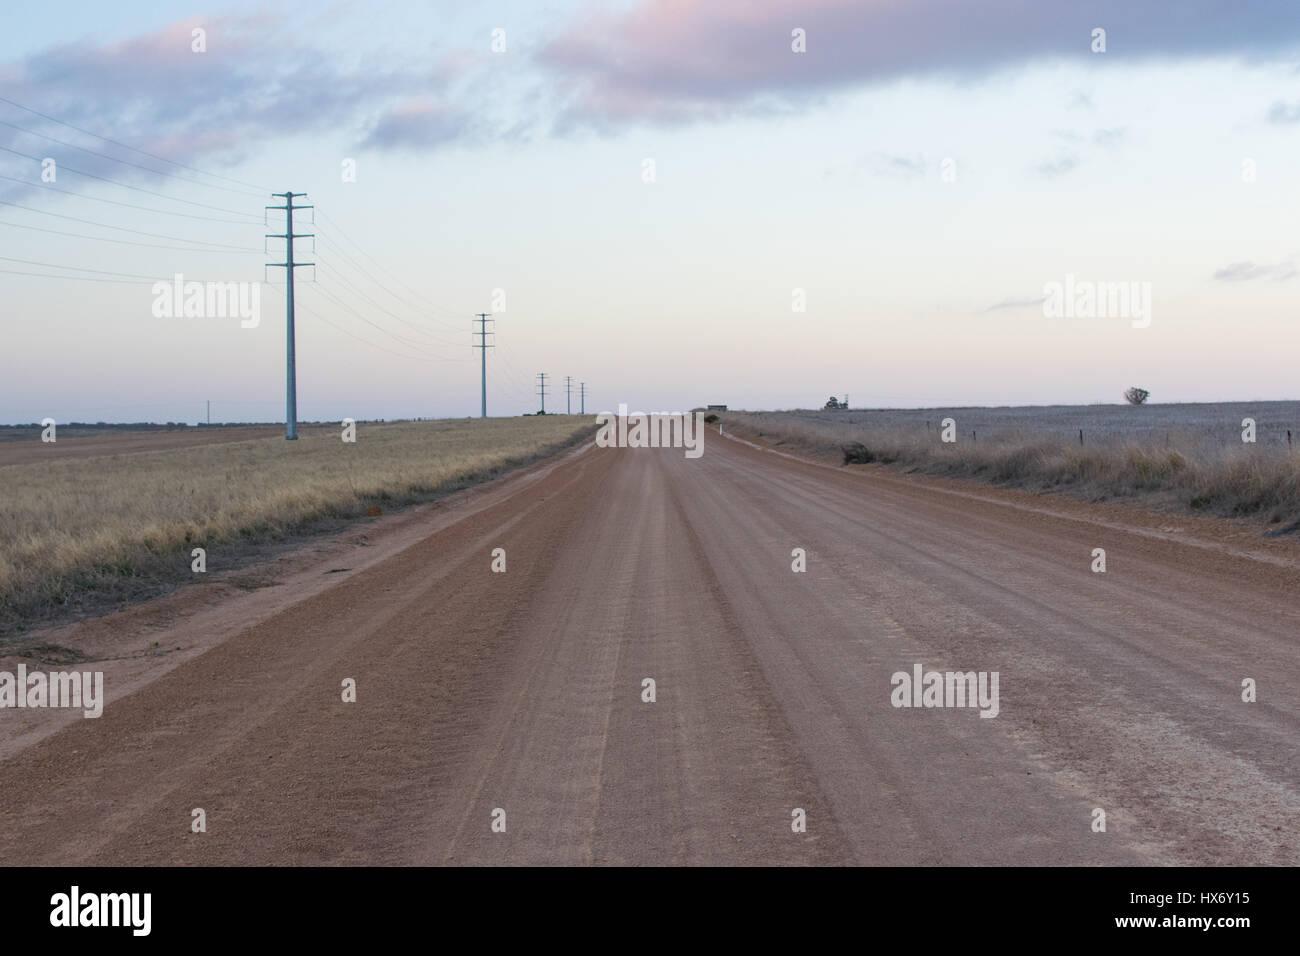 Australian dirt road following power line - Stock Image